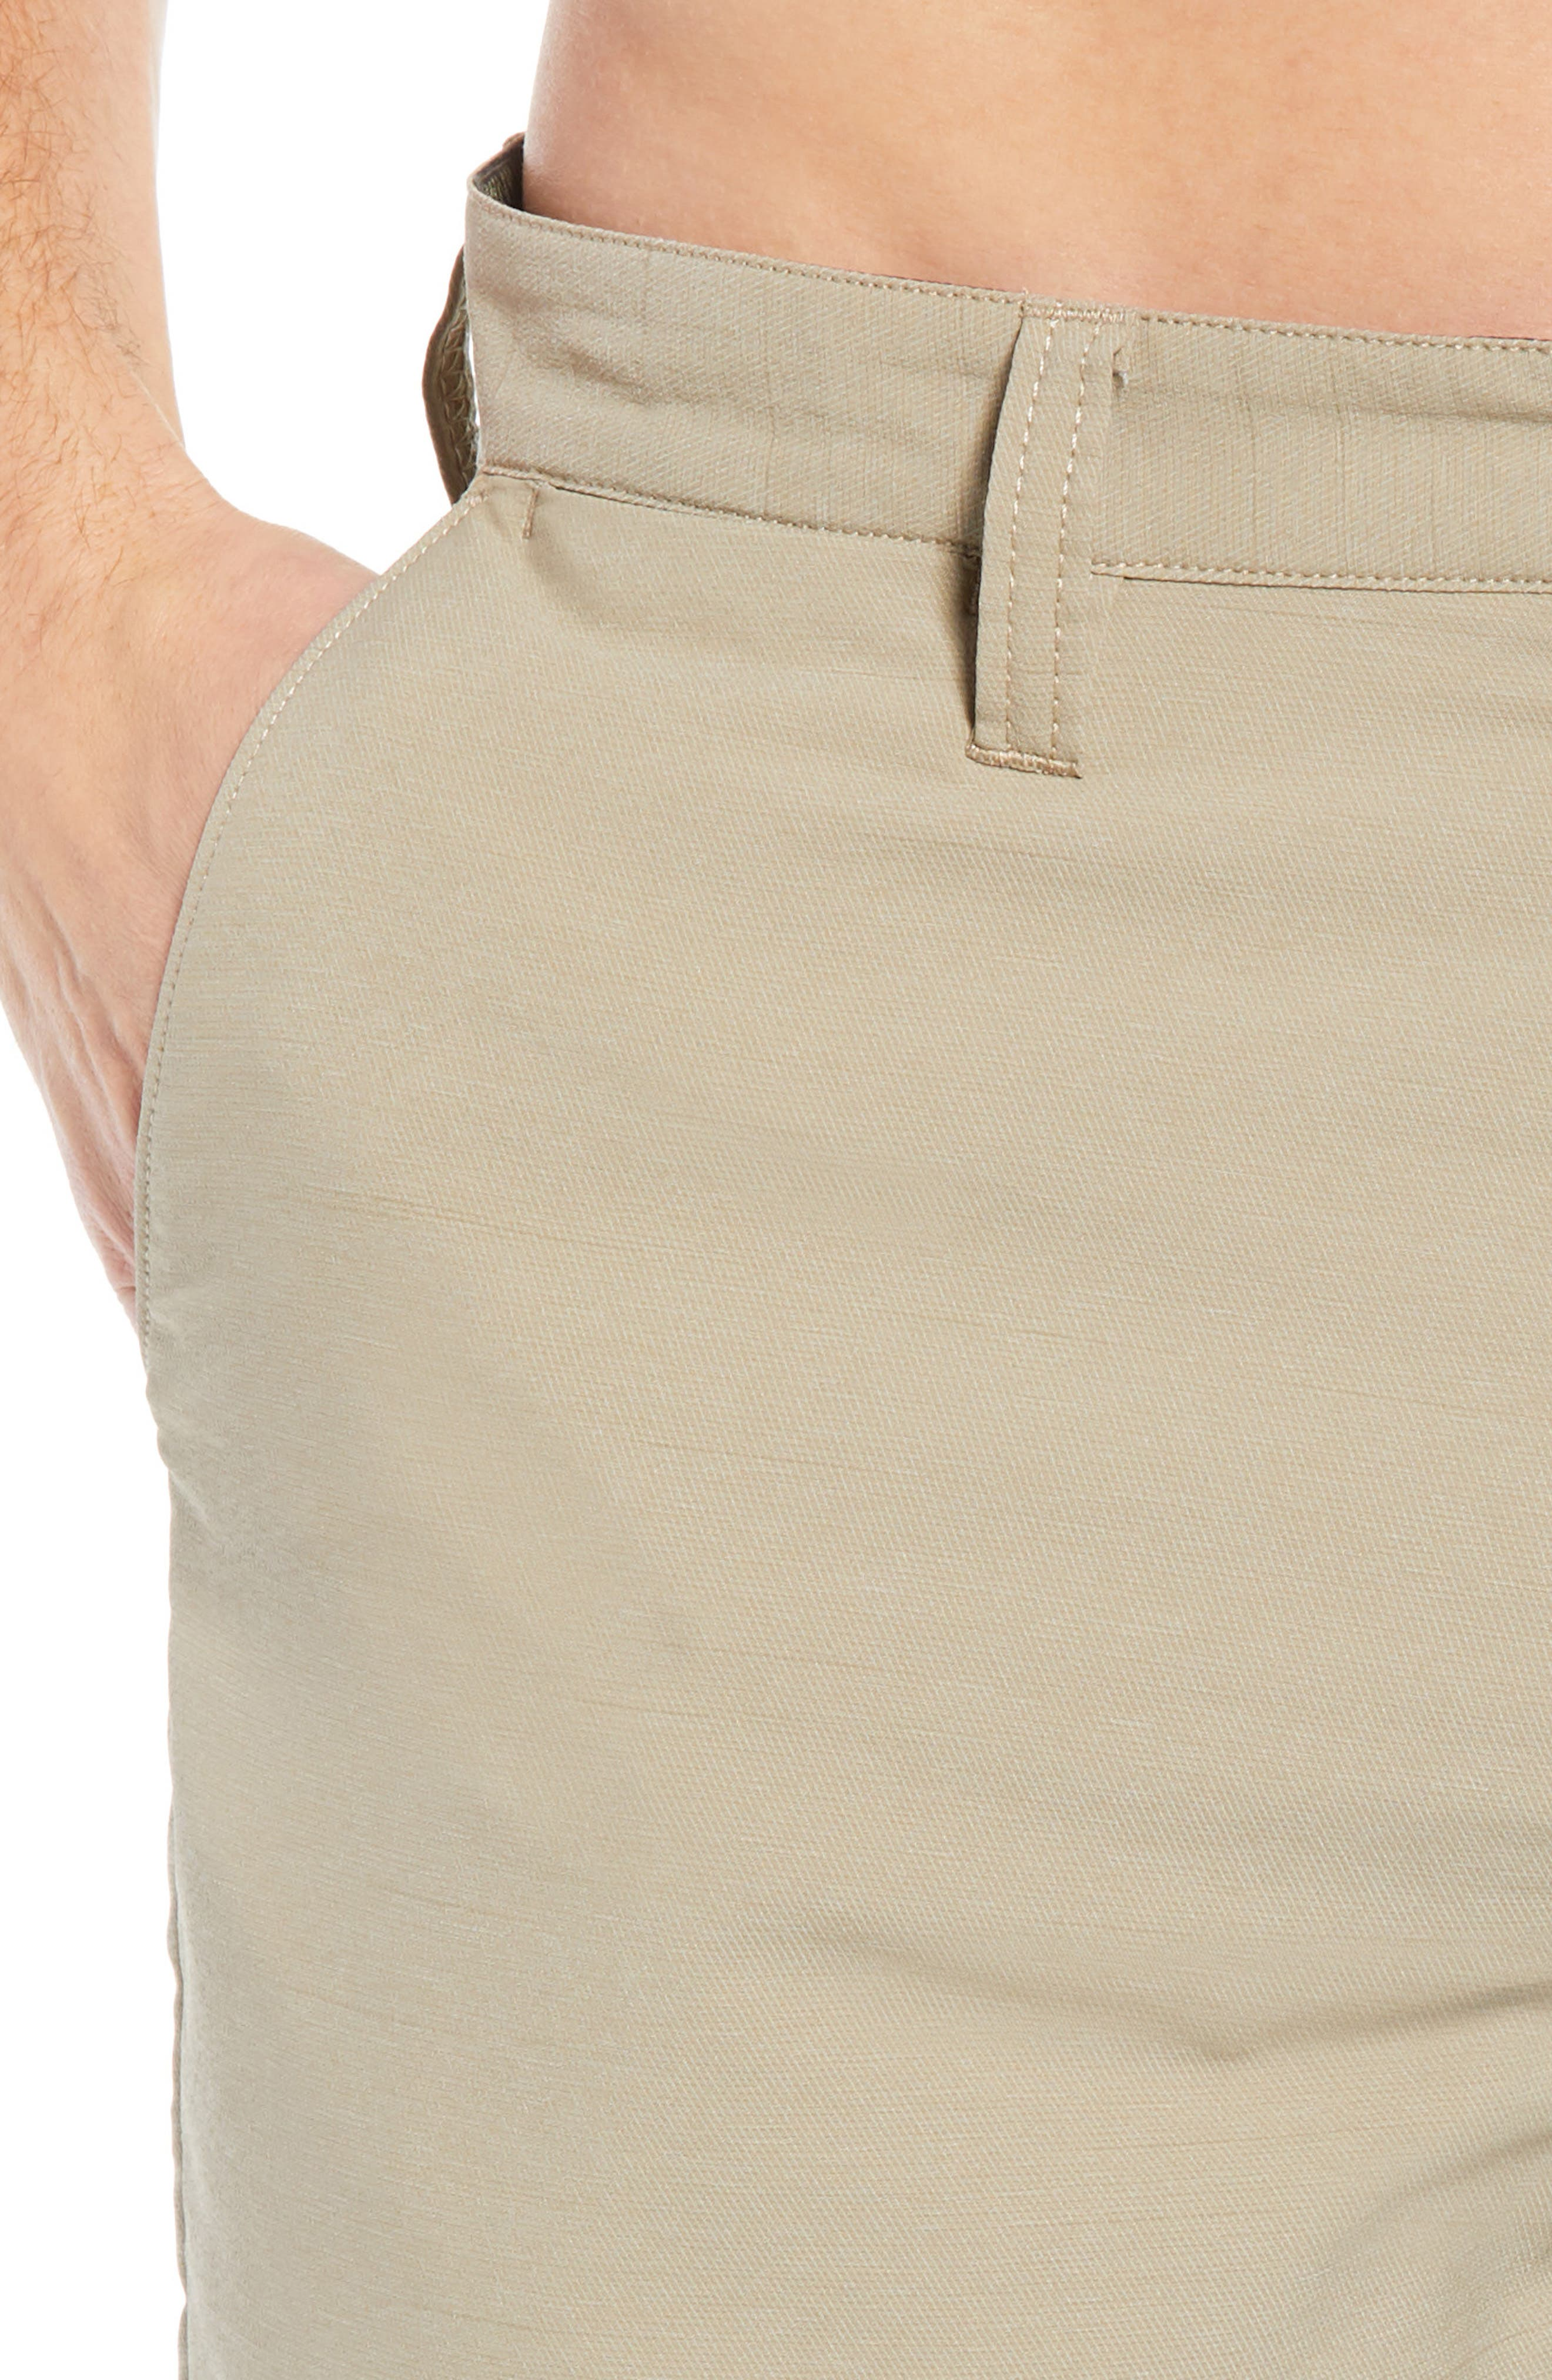 Surfreak Hybrid Shorts,                             Alternate thumbnail 4, color,                             KHAKI